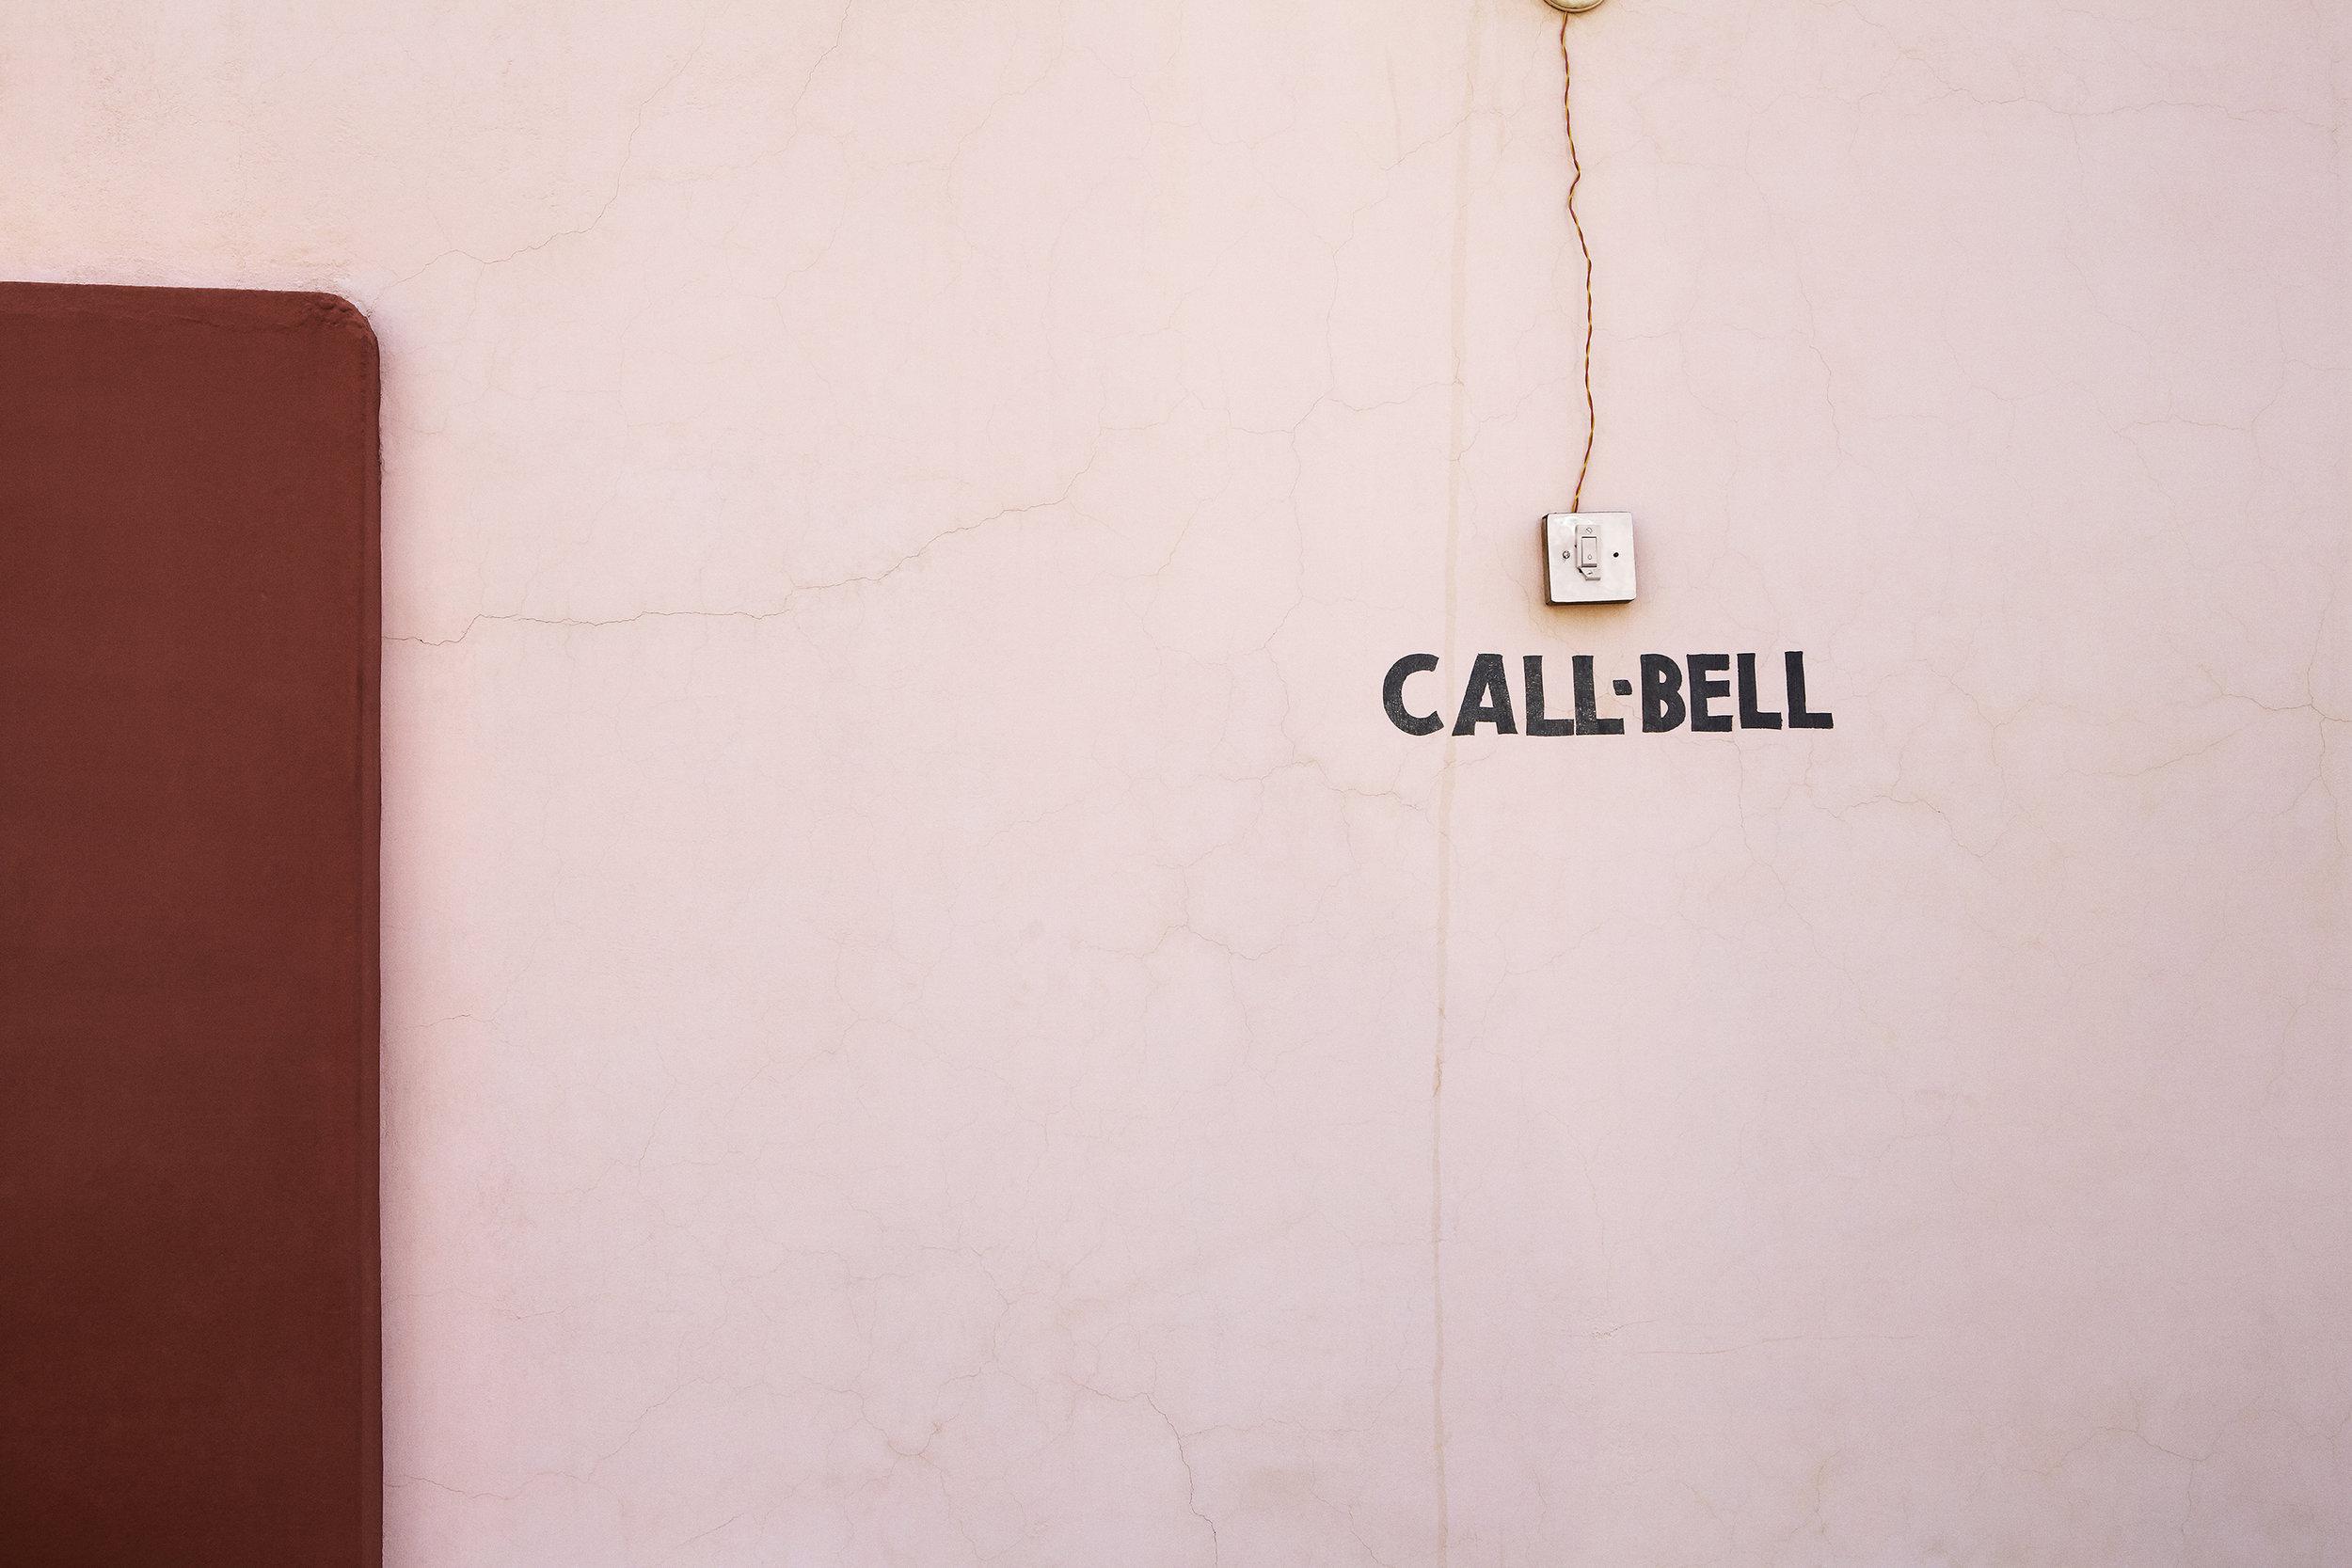 Call-Bell